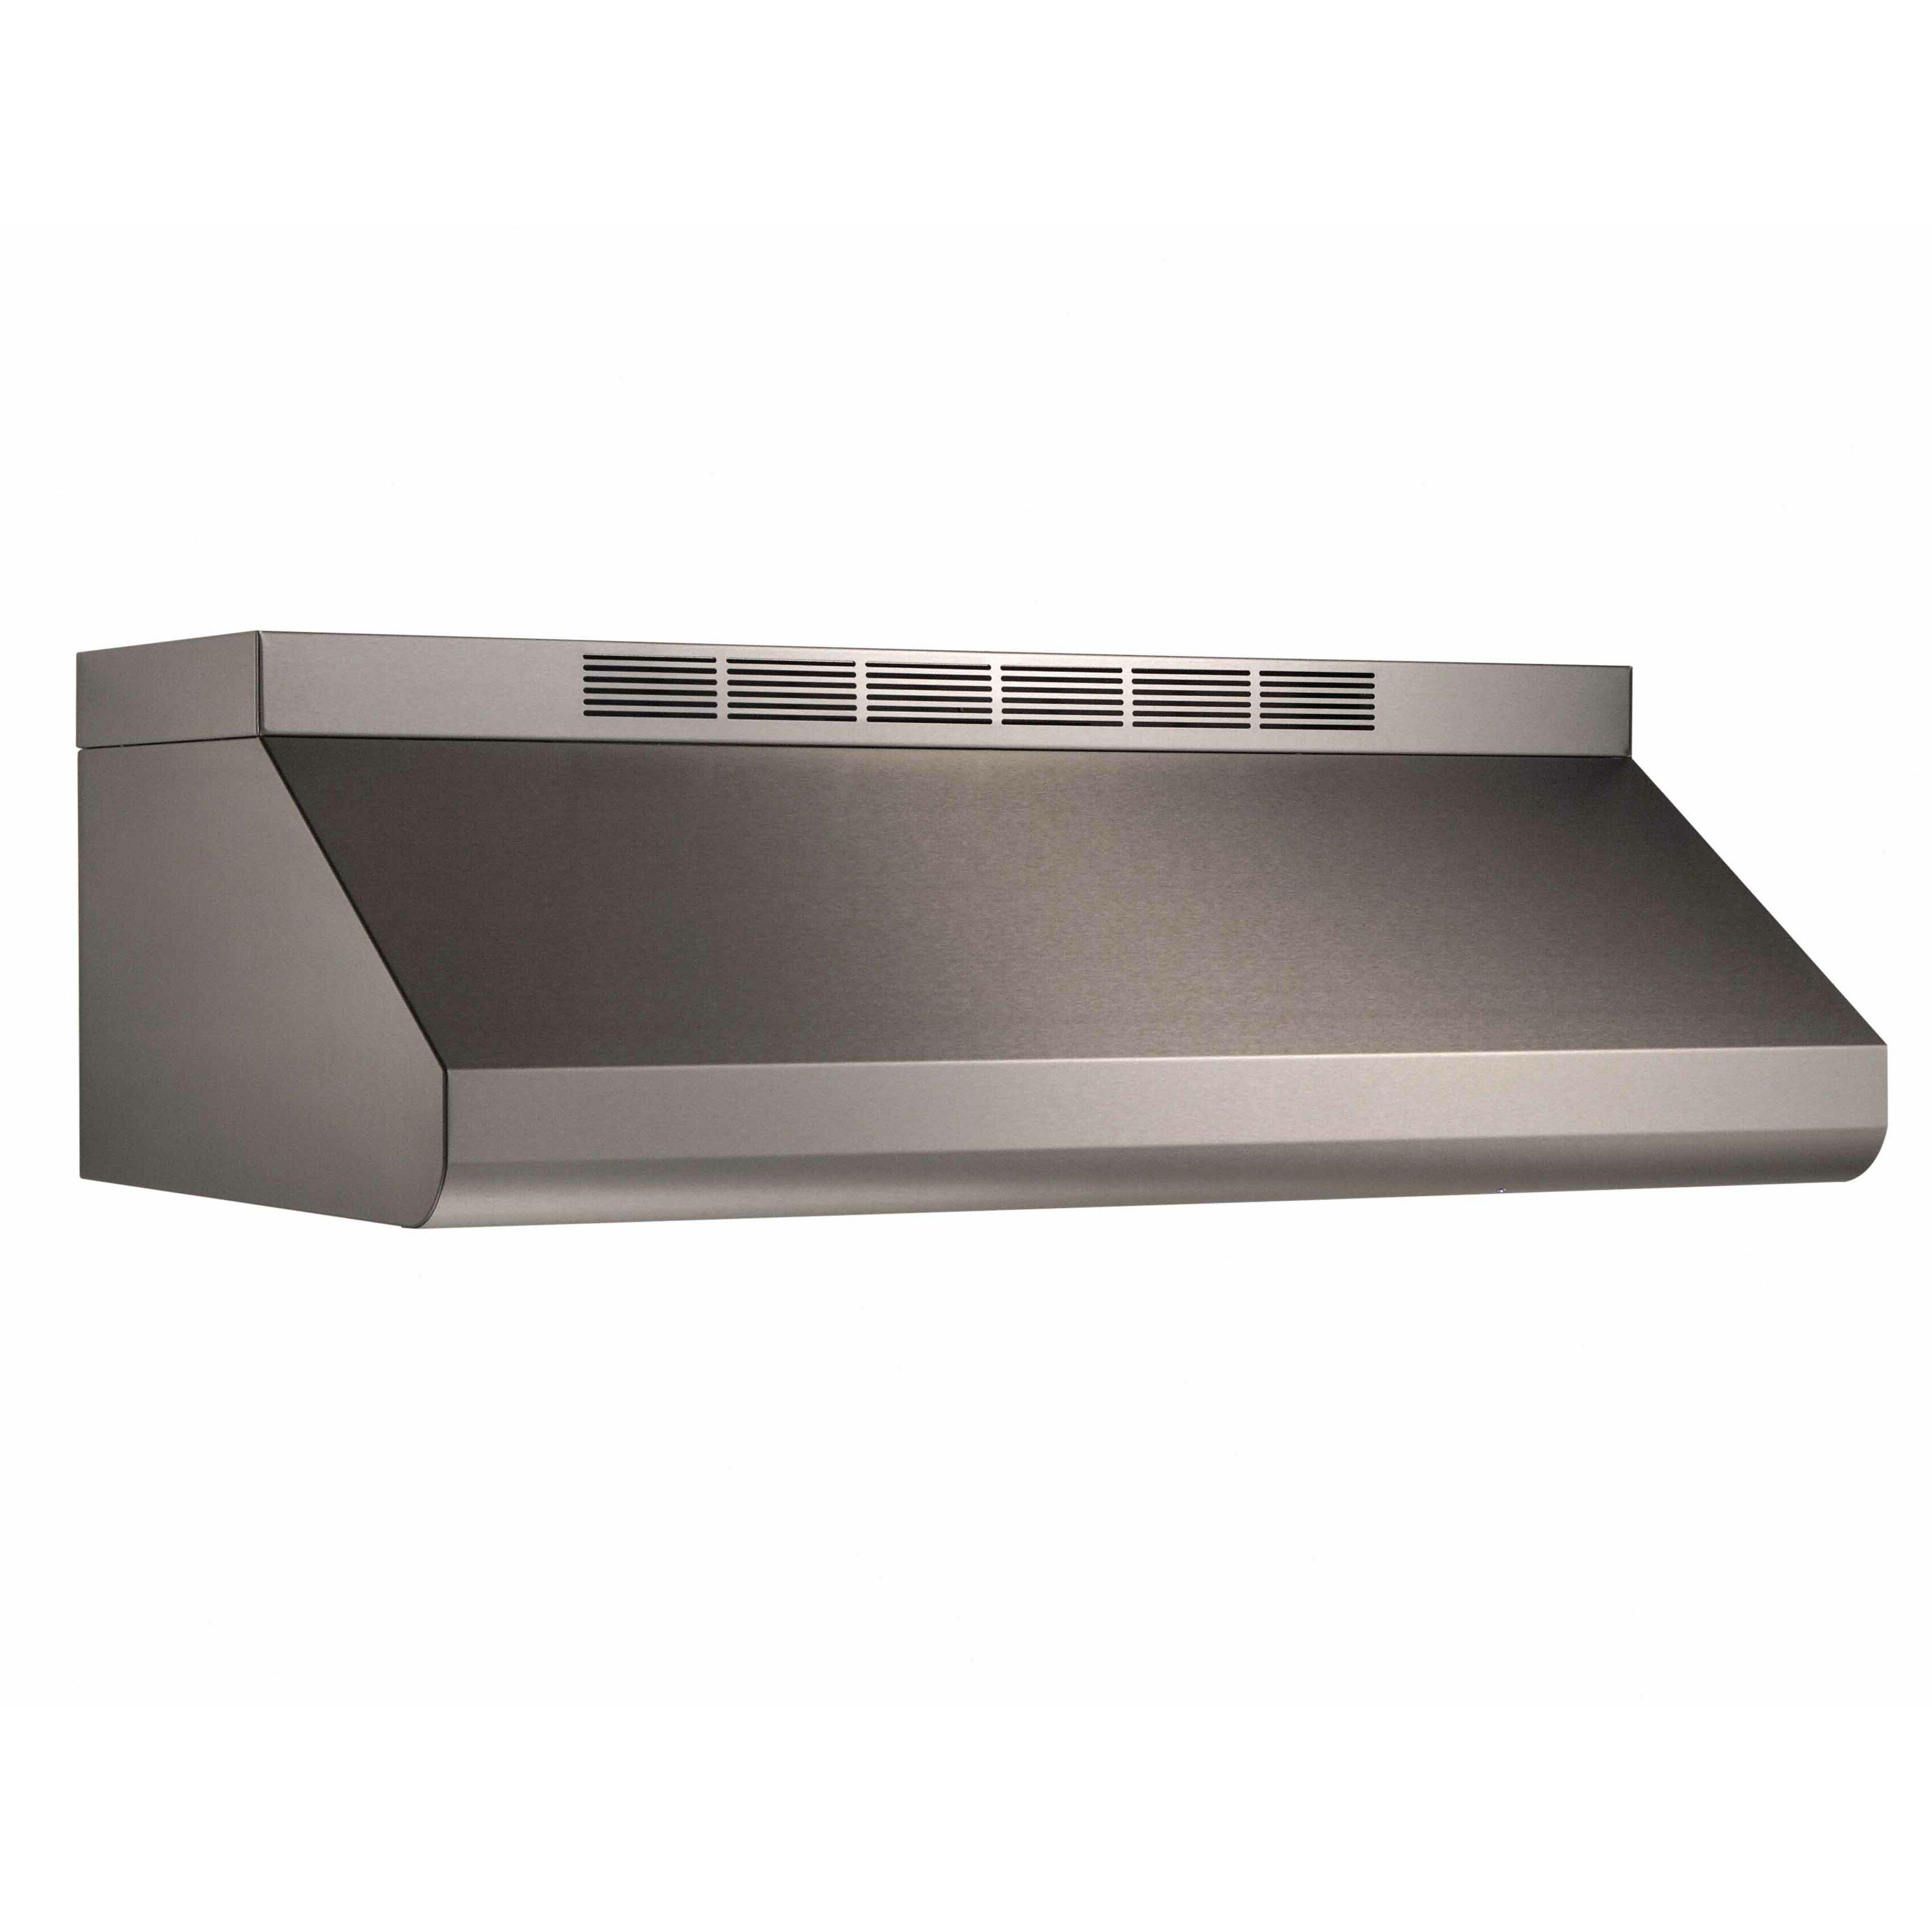 30 Under Cabinet Range Hood Broan 30 600 Cfm Convertible Under Cabinet Range Hood Reviews